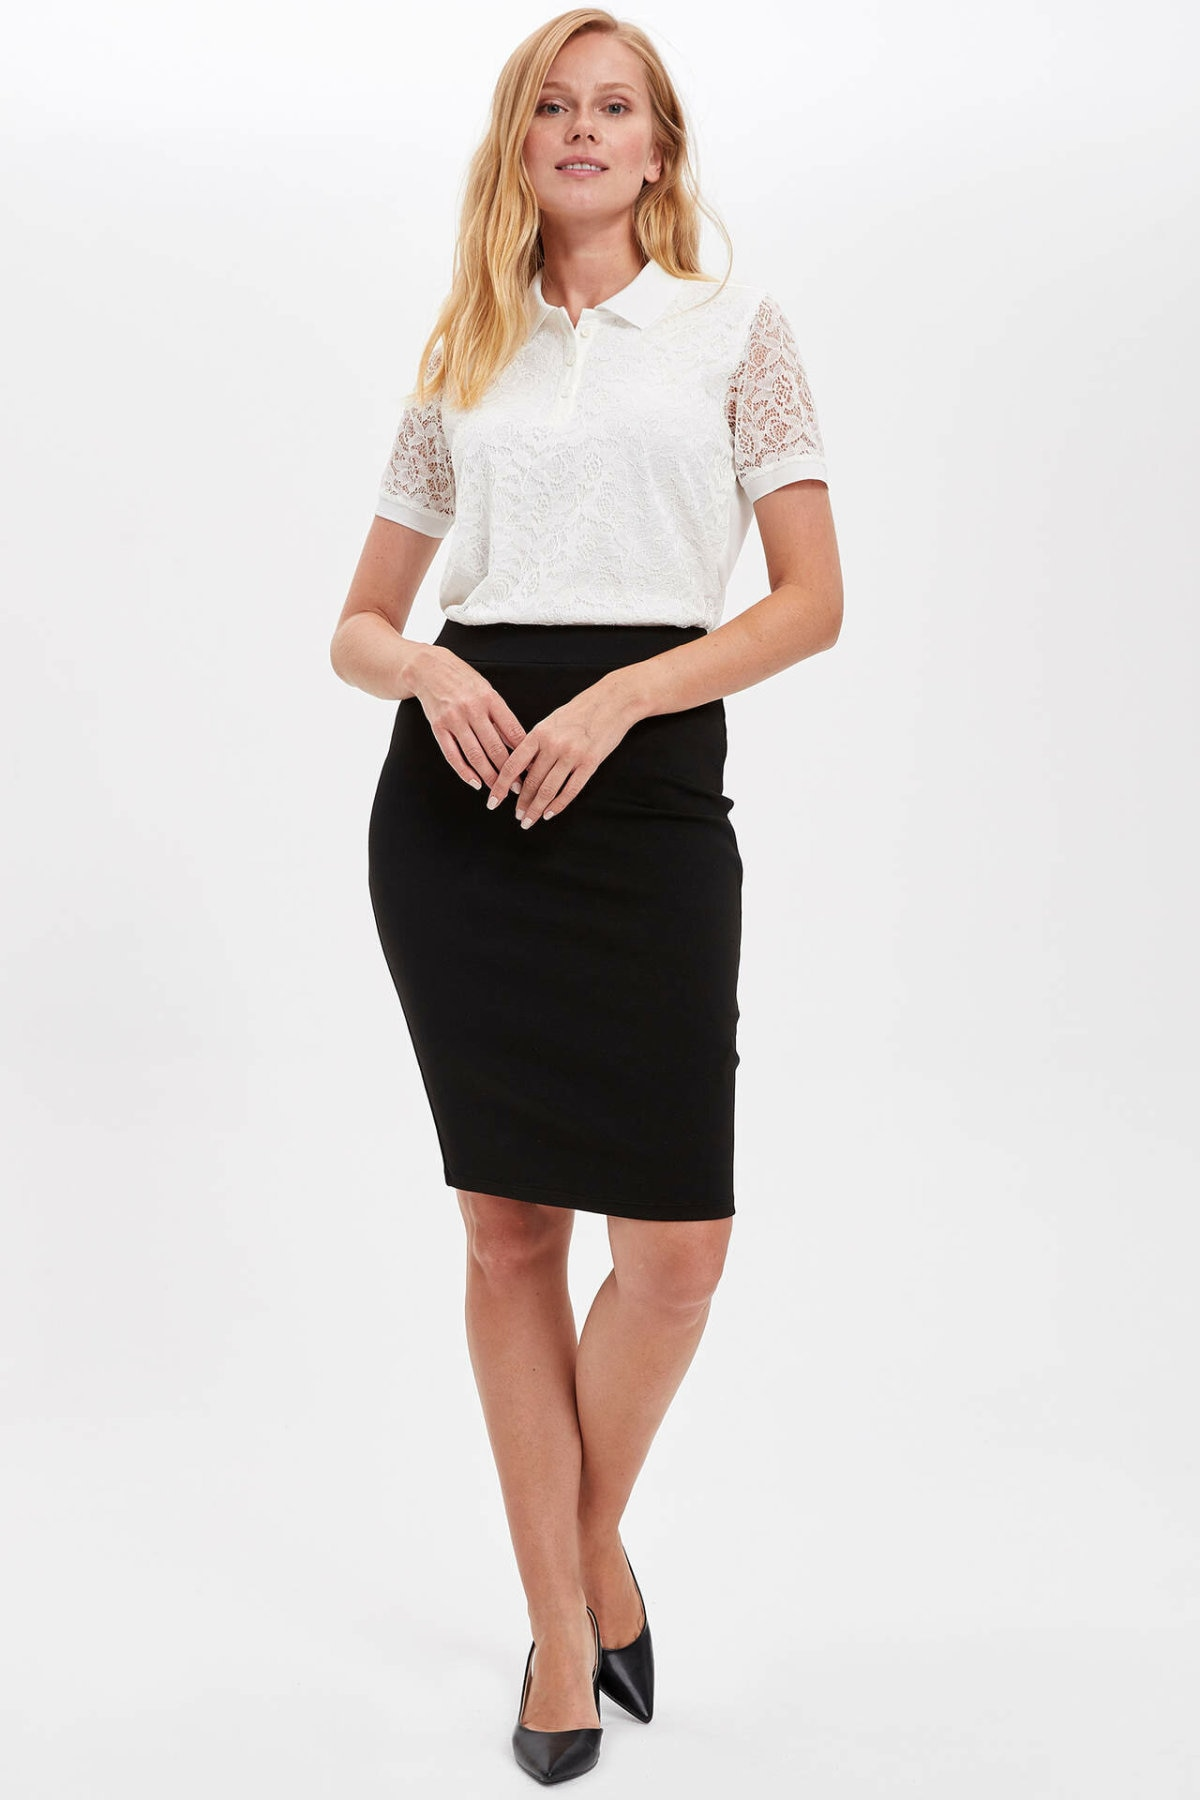 DeFacto Solid Color Skirts Woman Office Plaid Pattern Pencil High Waist Skinny Sexy Midi Skirt Womens Autumn Winter -K6736AZ19AU